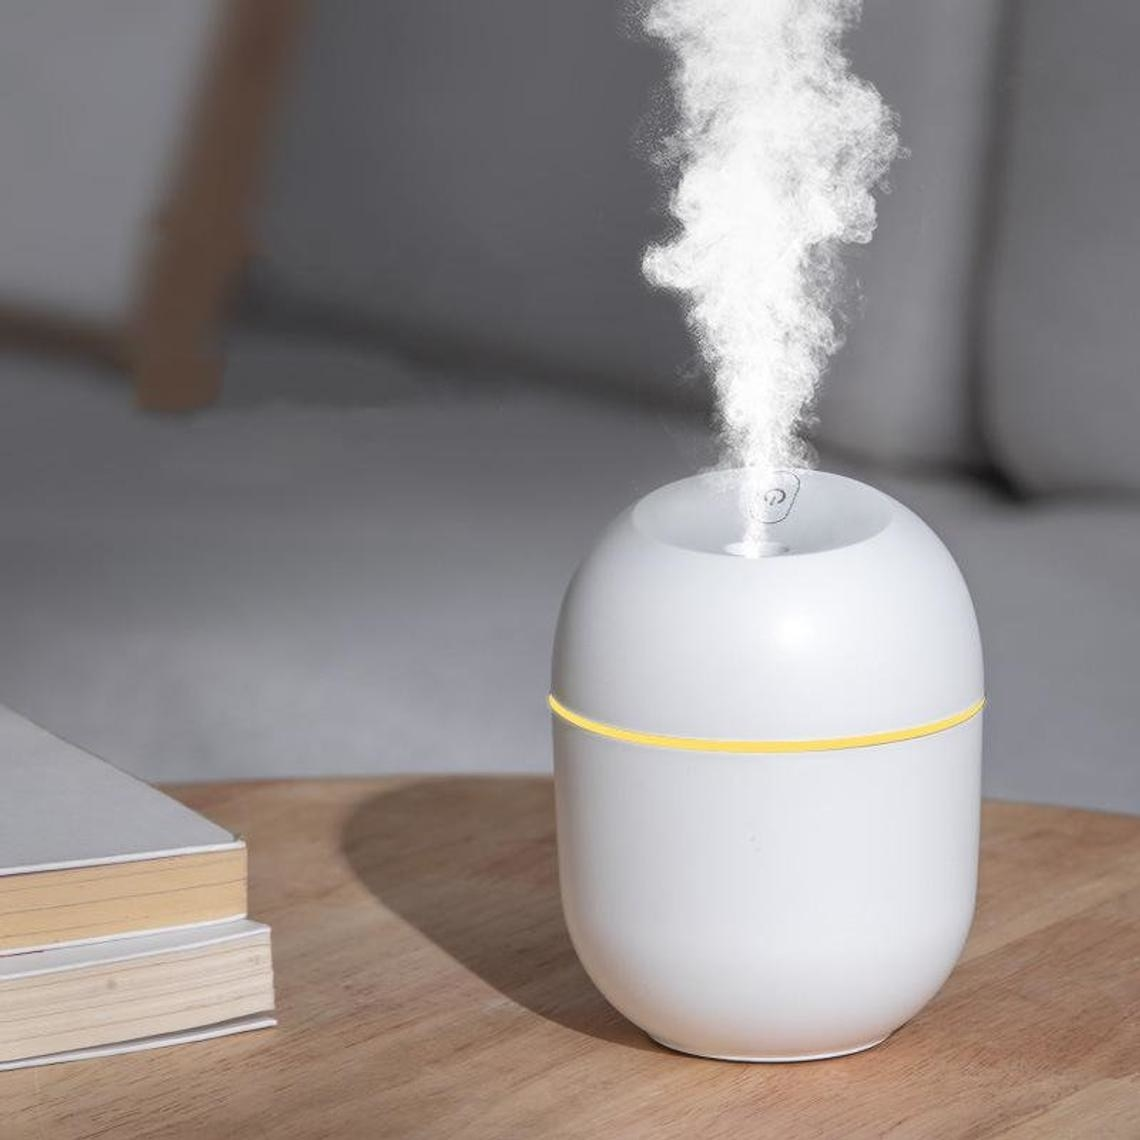 white oval shape humidifier